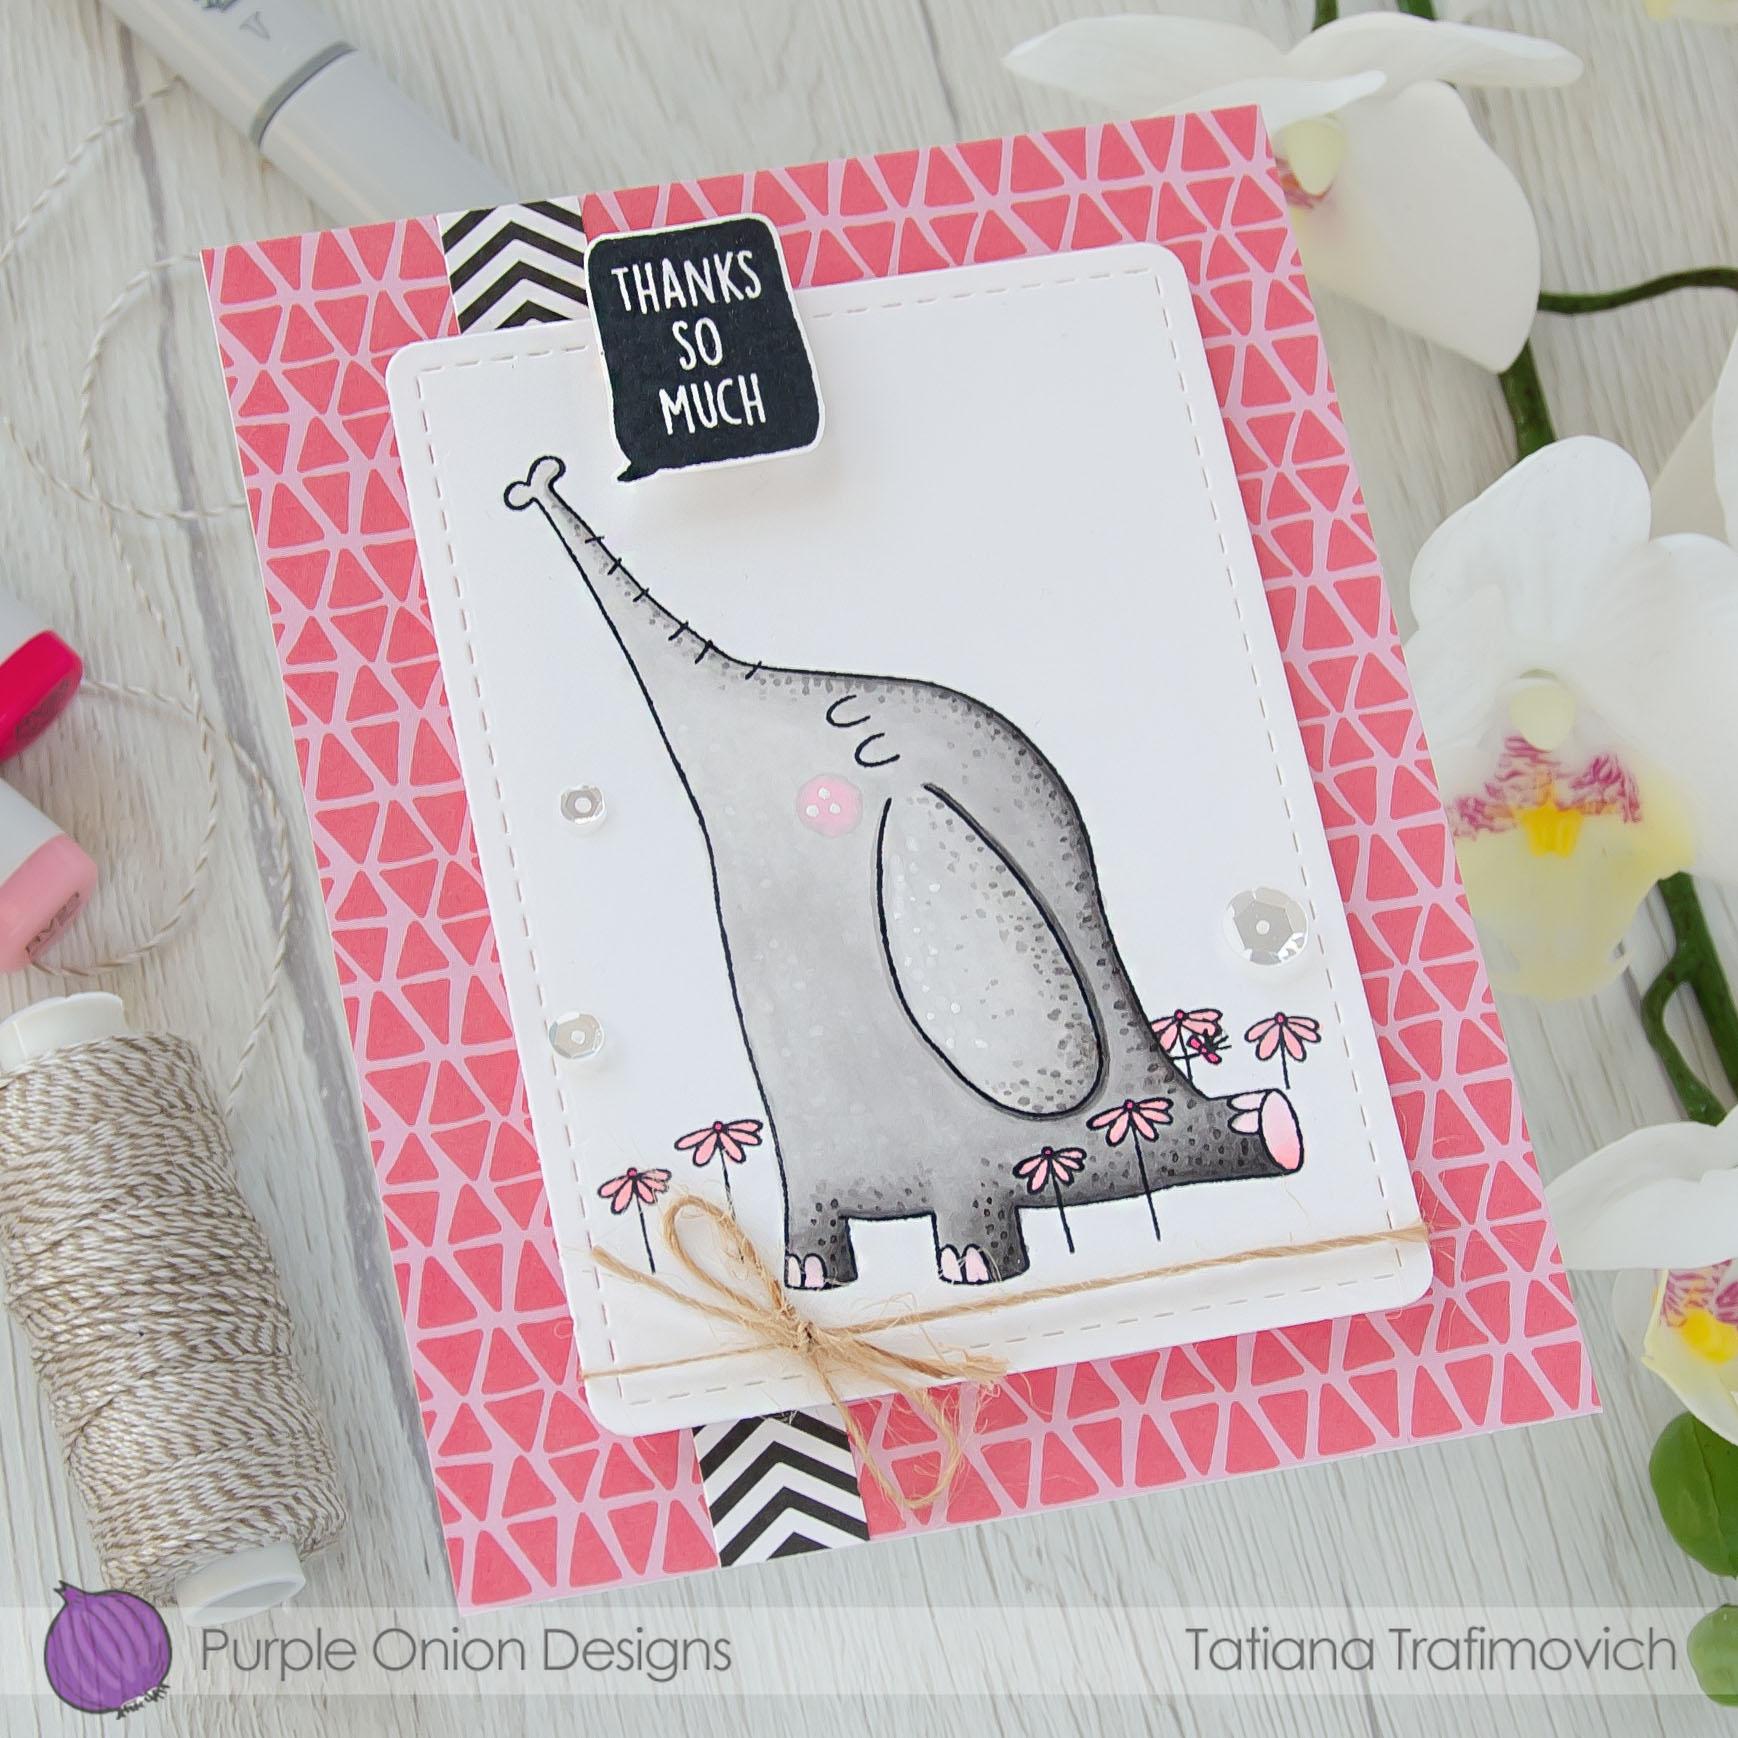 Thanks So Much #handmade card by Tatiana Trafimovich #tatianacraftandart - stamps by Purple Onion Designs